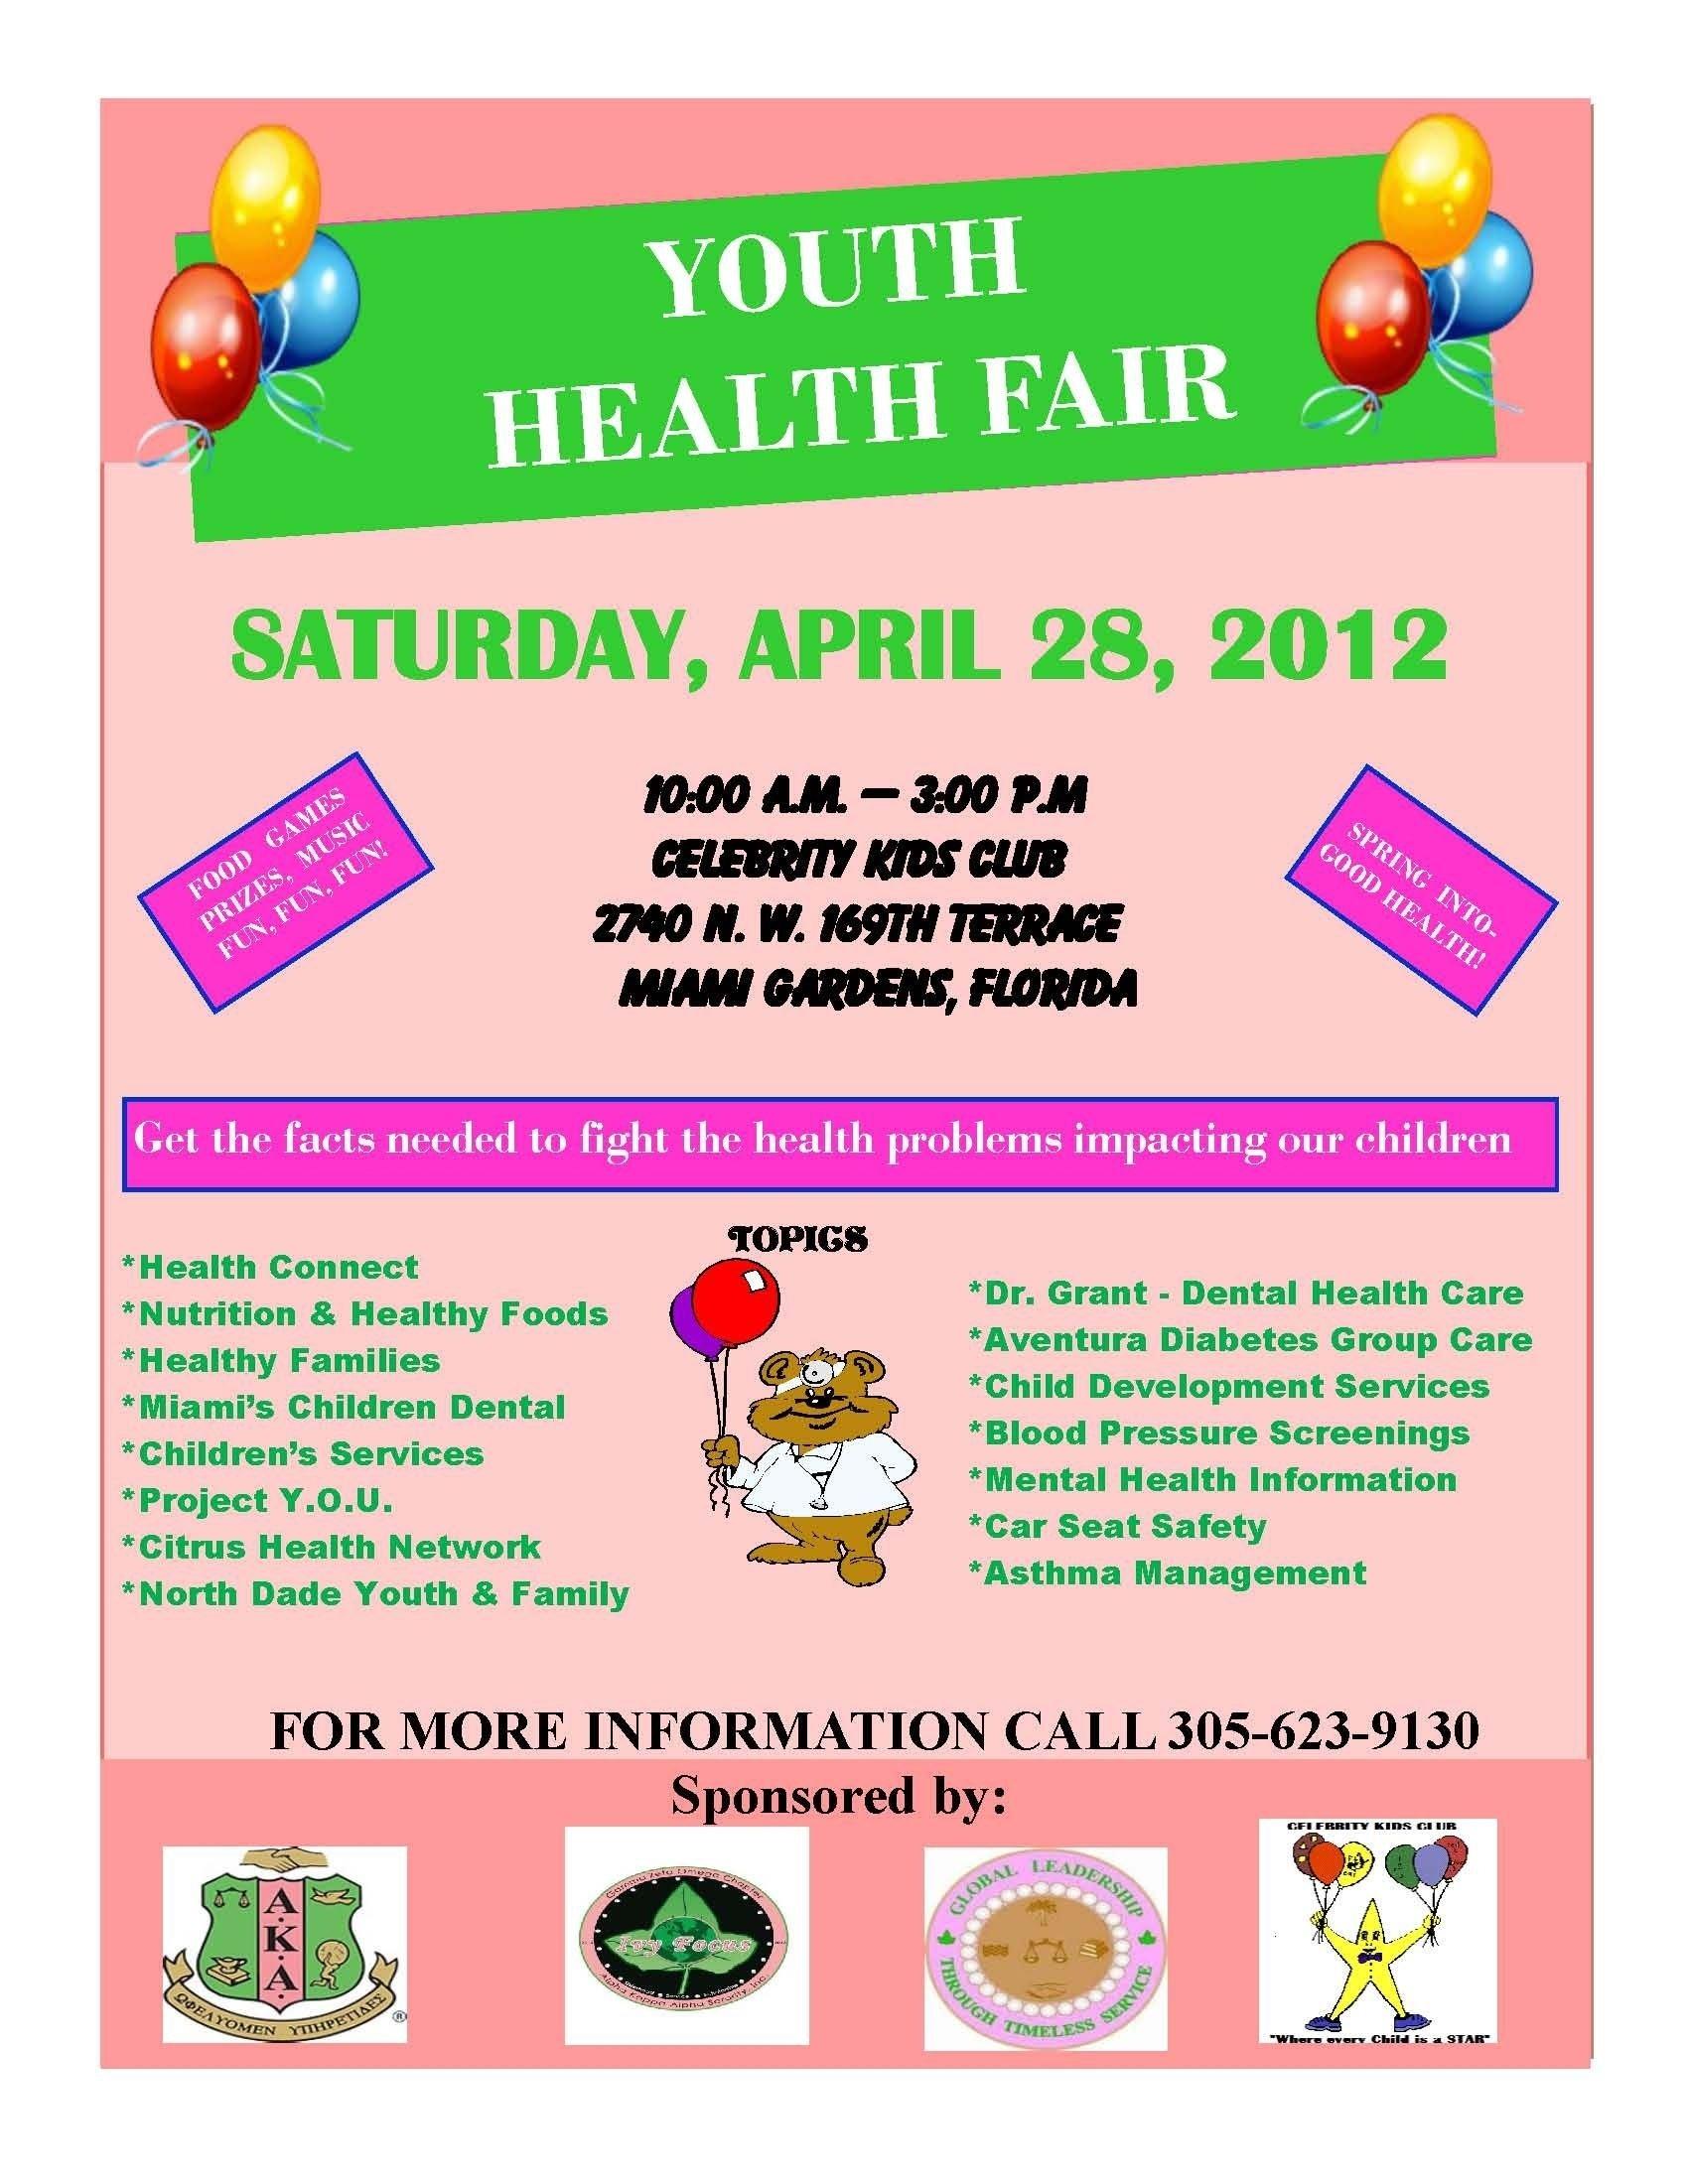 10 Stylish Health Fair Ideas For Kids join celebrity kids club for a youth health fair on april 28 2021